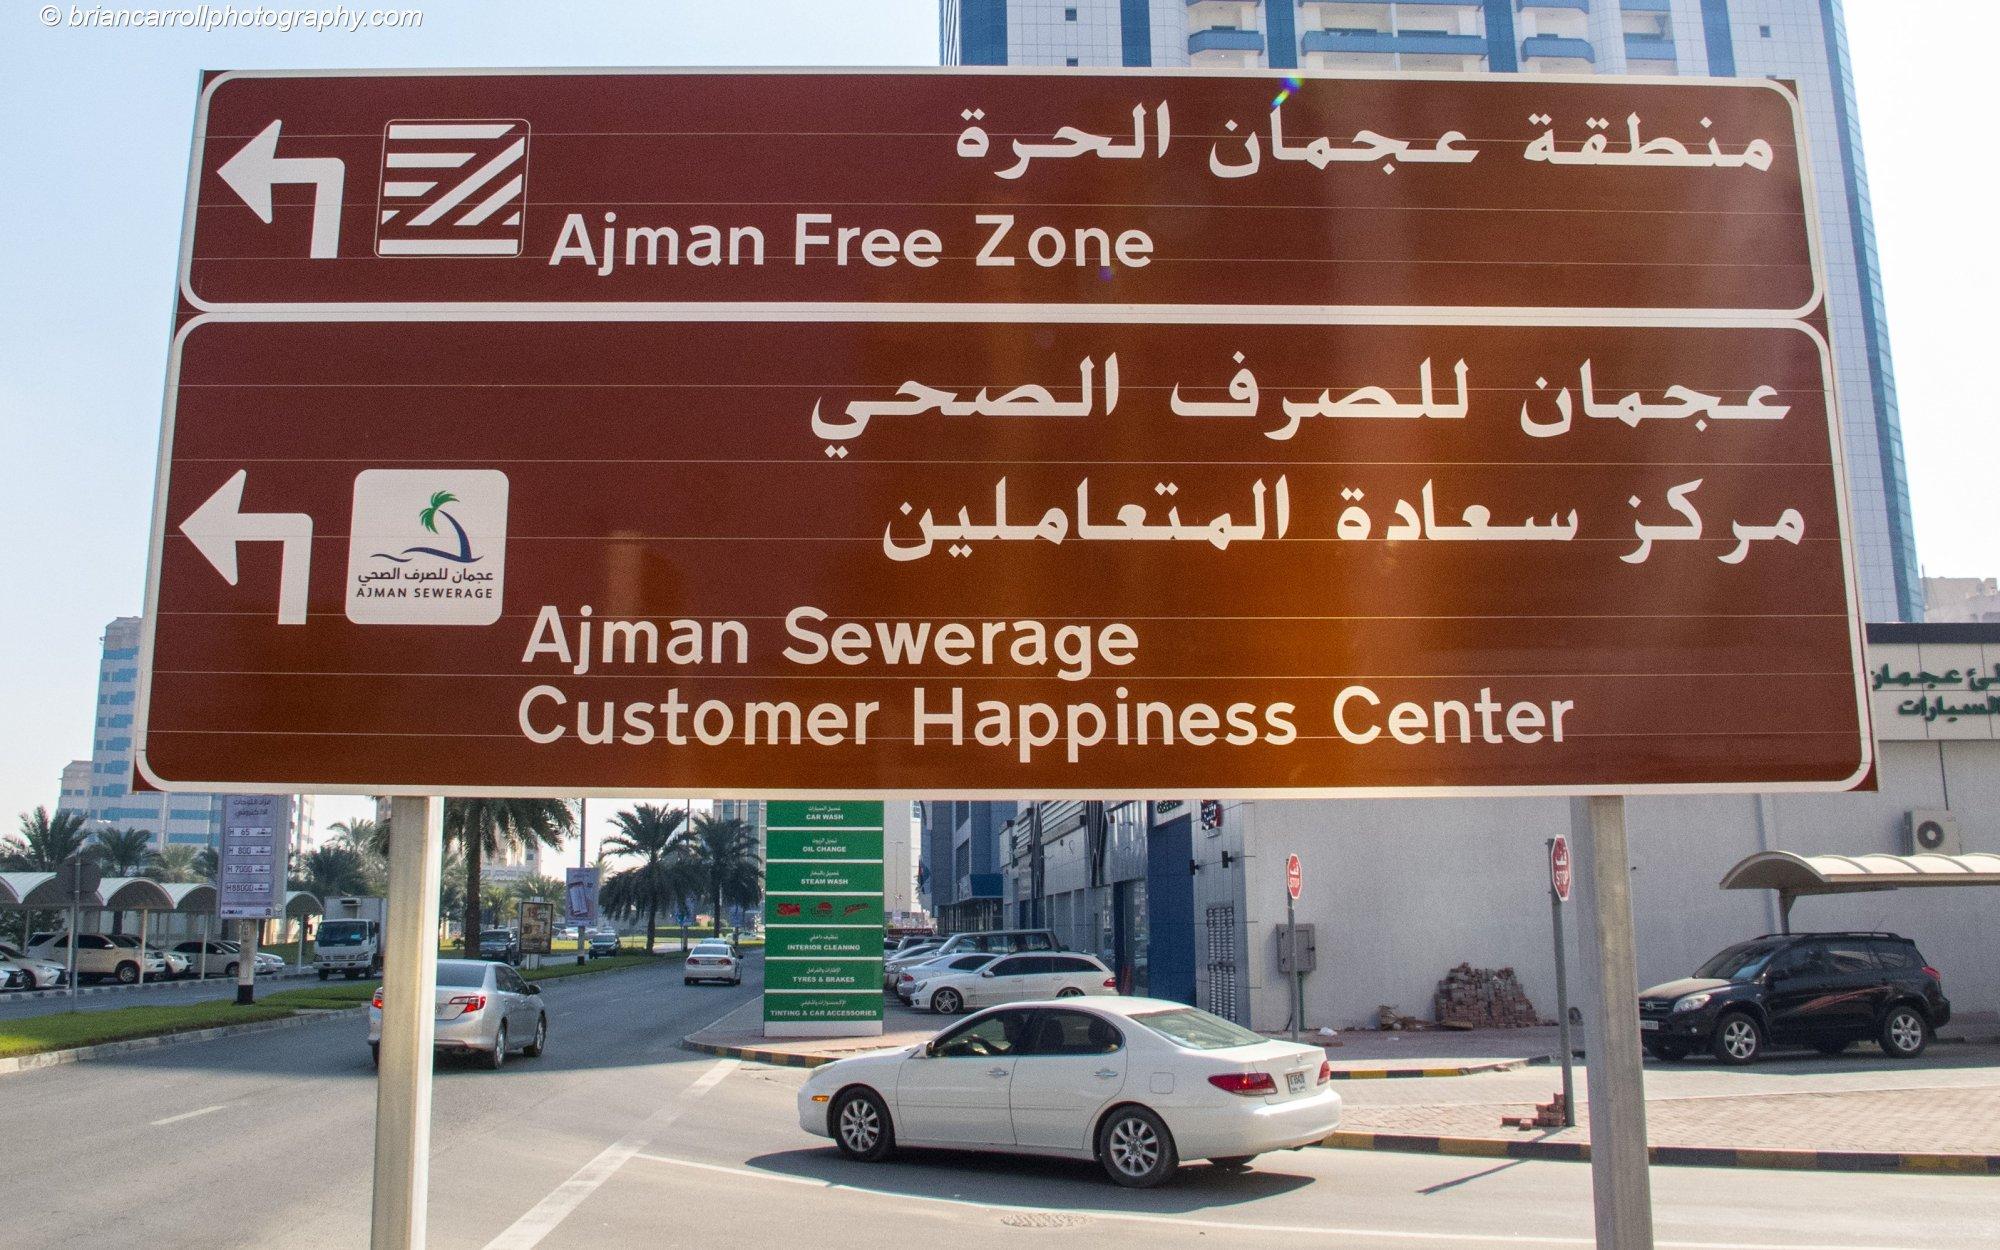 Ajman Sewerage Customer Happiness Center, UAE